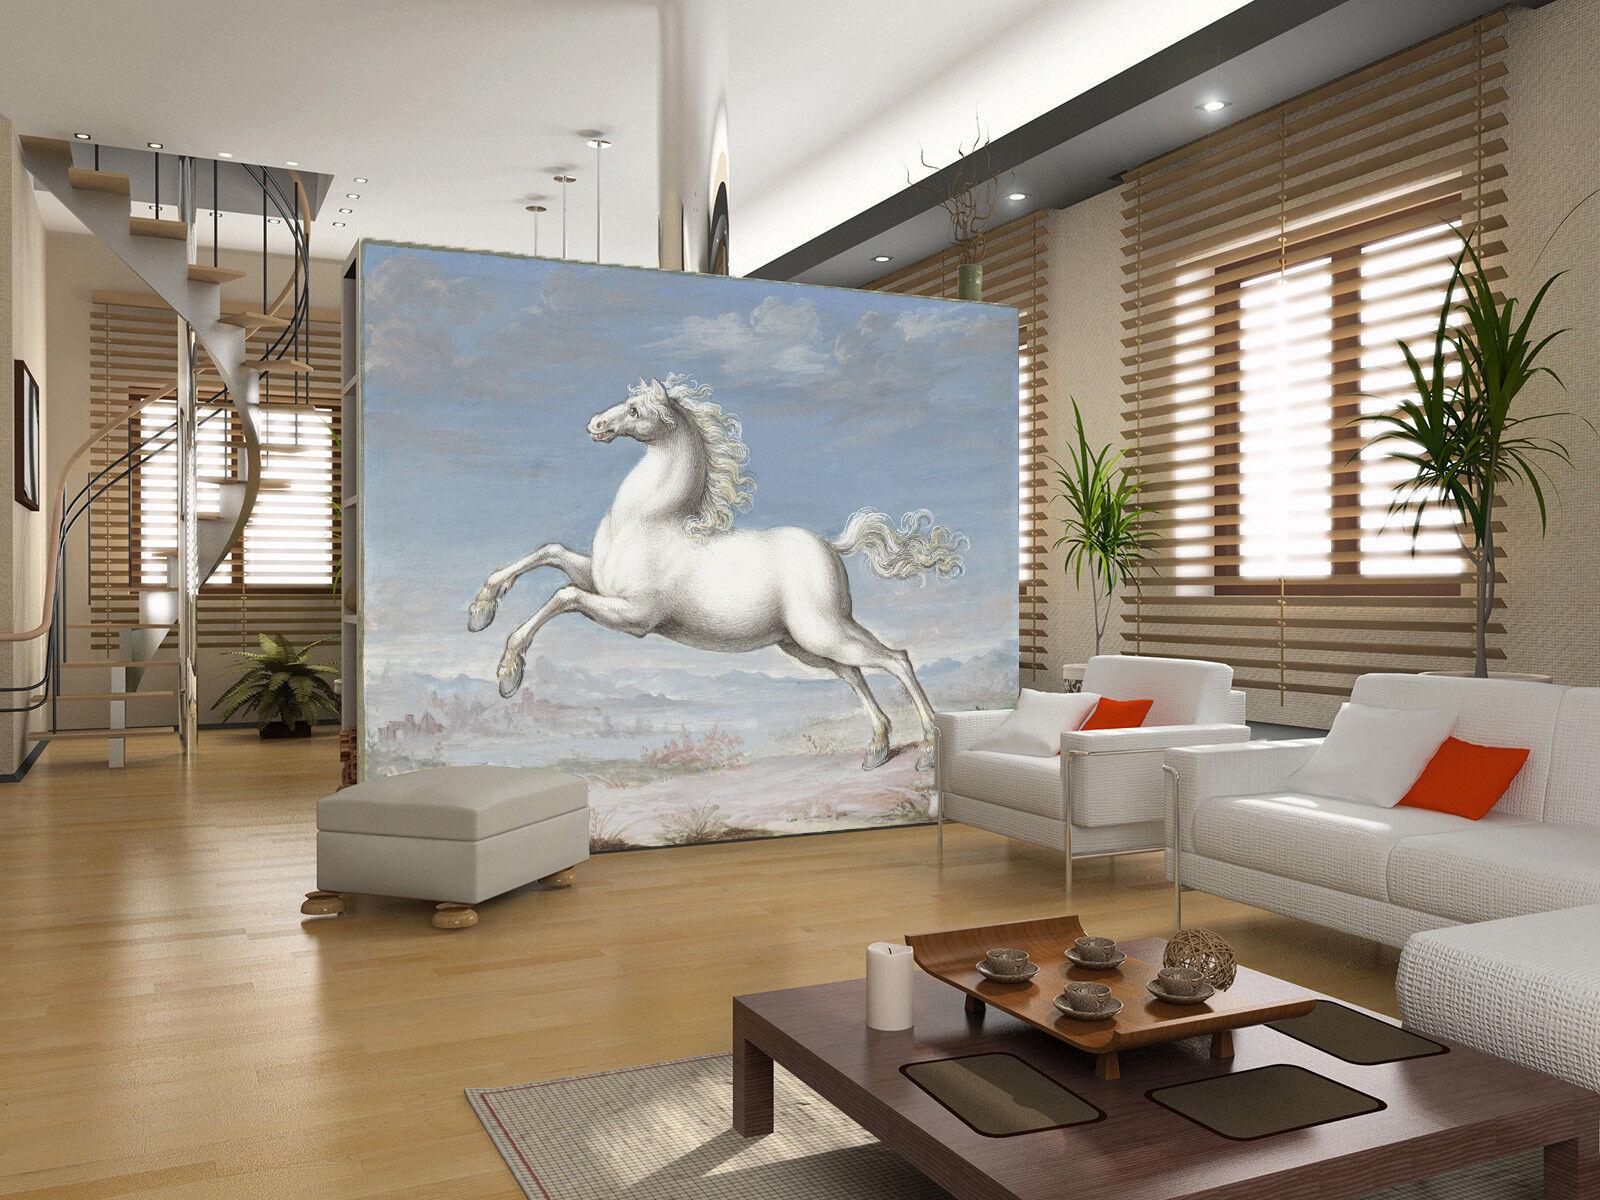 3D Cliff Weiß Horse 8 Wall Paper Murals Wall Print Wall Wallpaper Mural AU Kyra